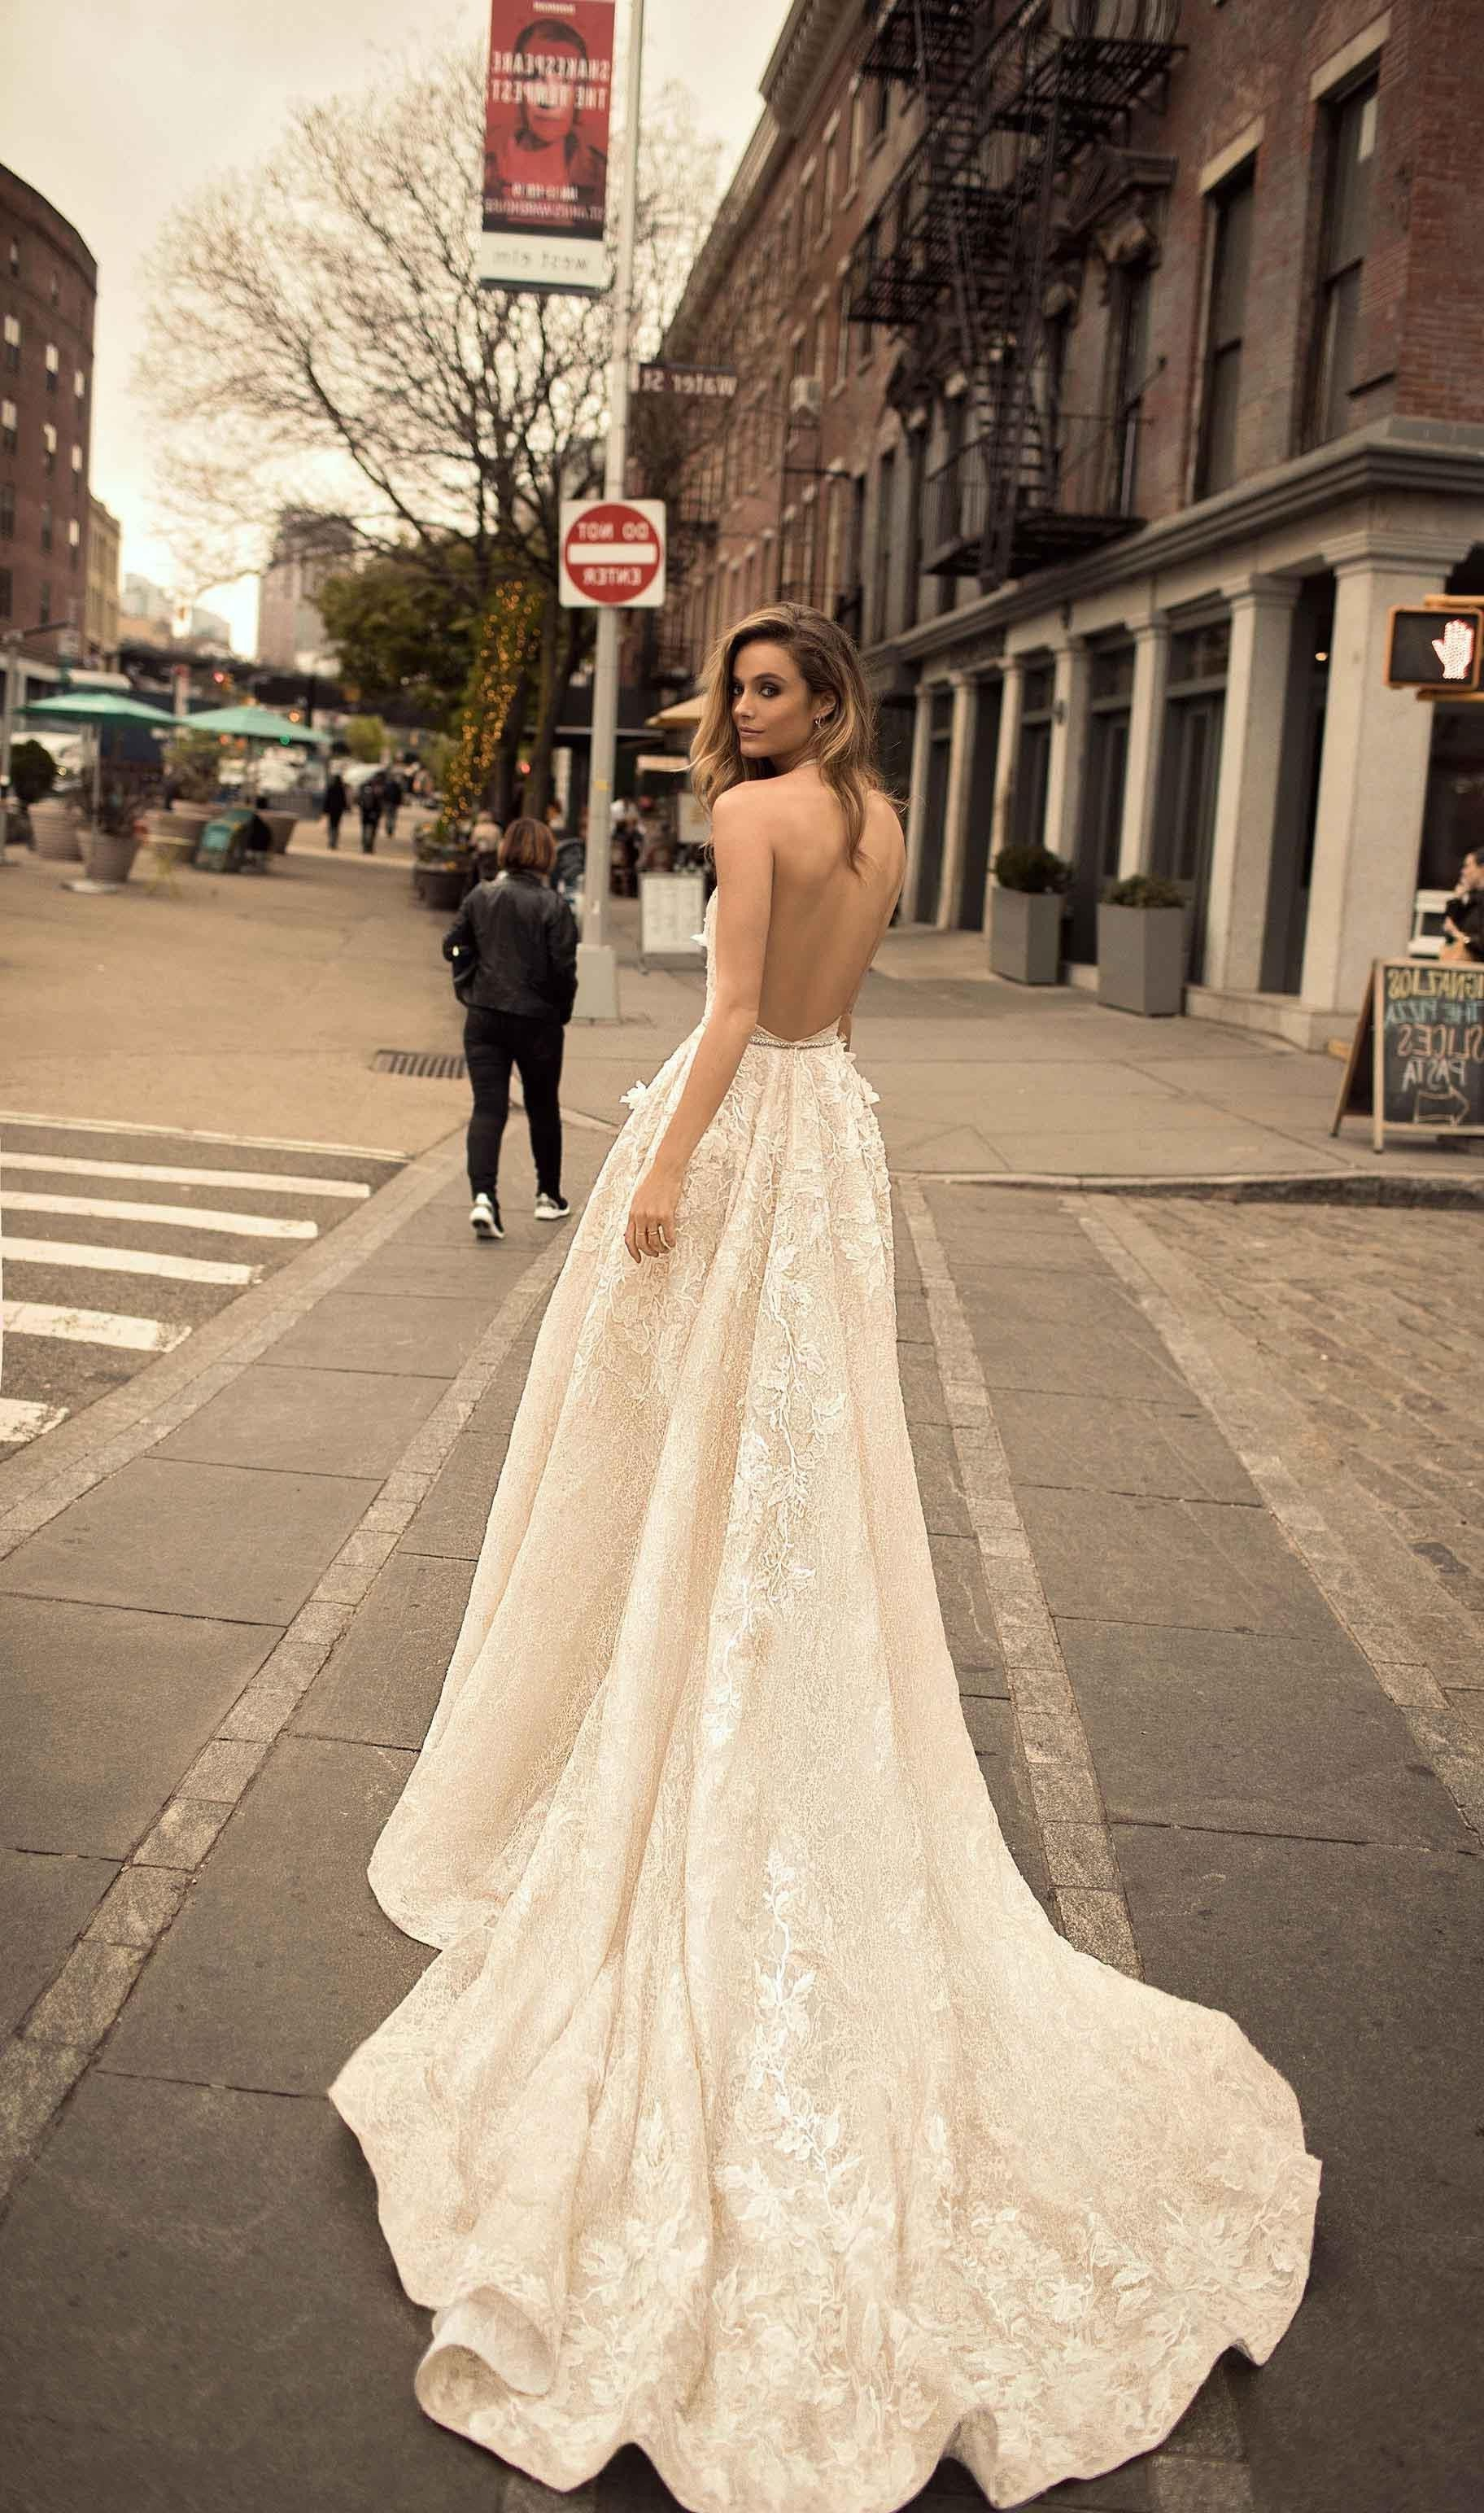 Bentuk Inspirasi Bridesmaid Hijab U3dh Wedding Ideas Colorful Wedding Dresses Enticing Wedding